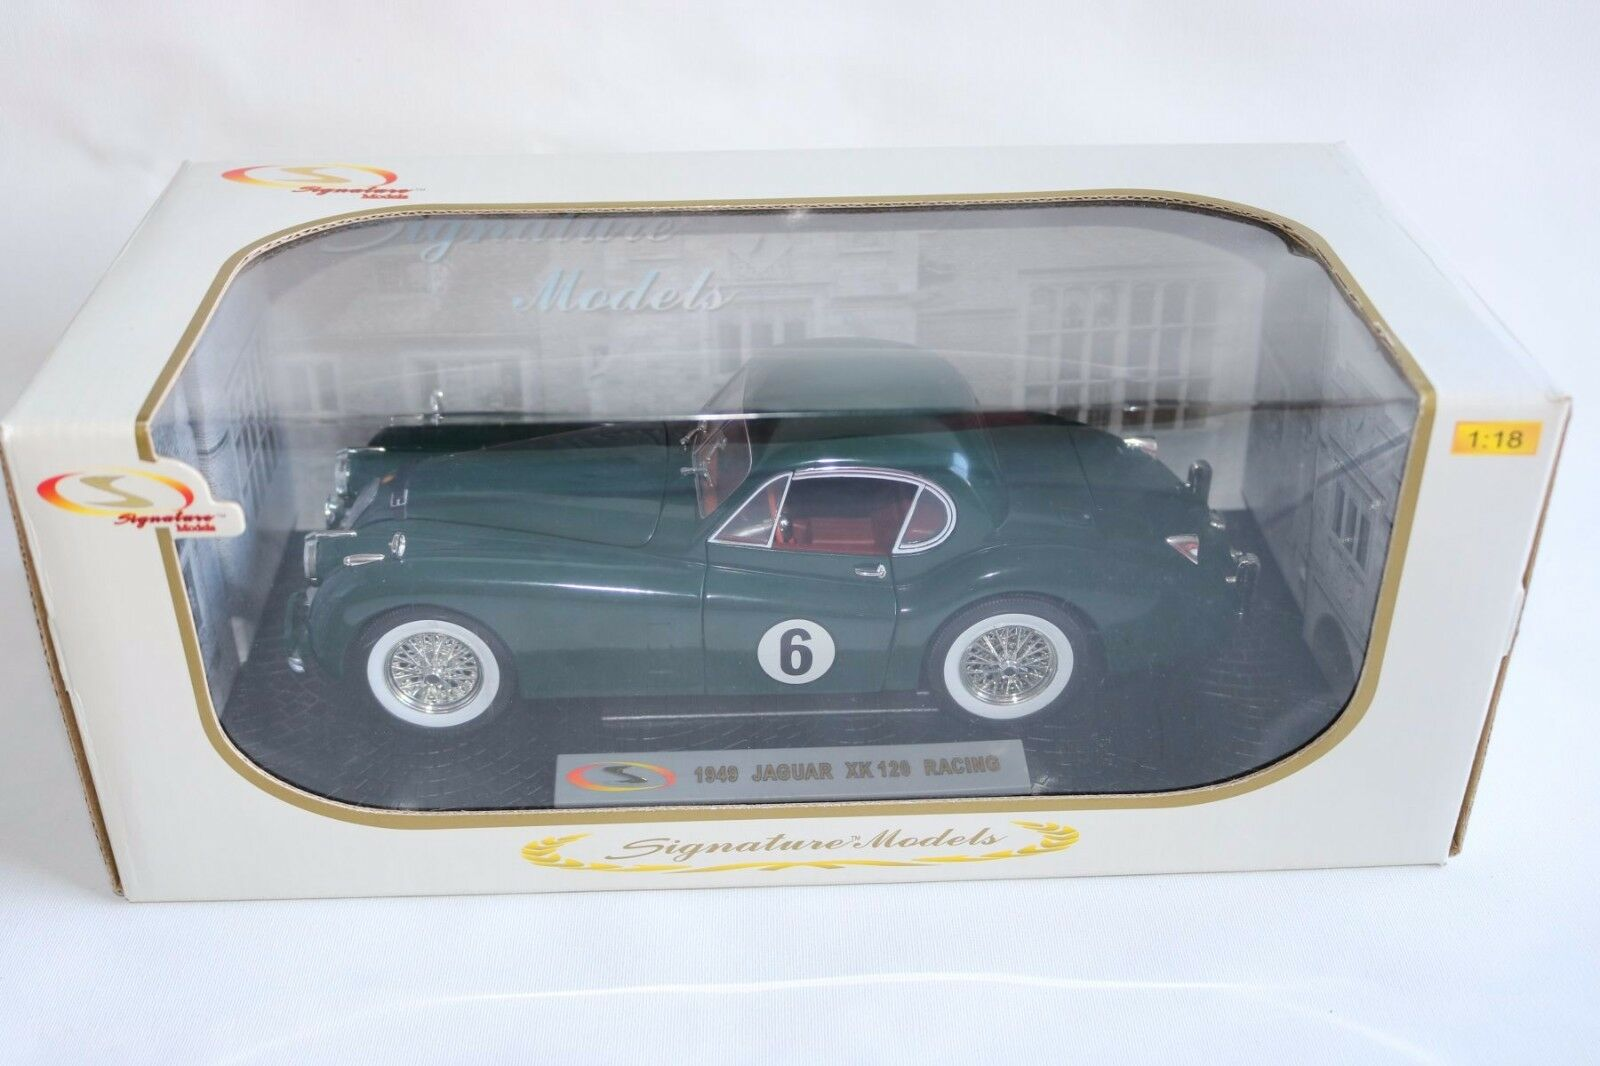 Jaguar xk 120 signature modelle xk120 racing Grün perfekt mint in kasten ovp knapp